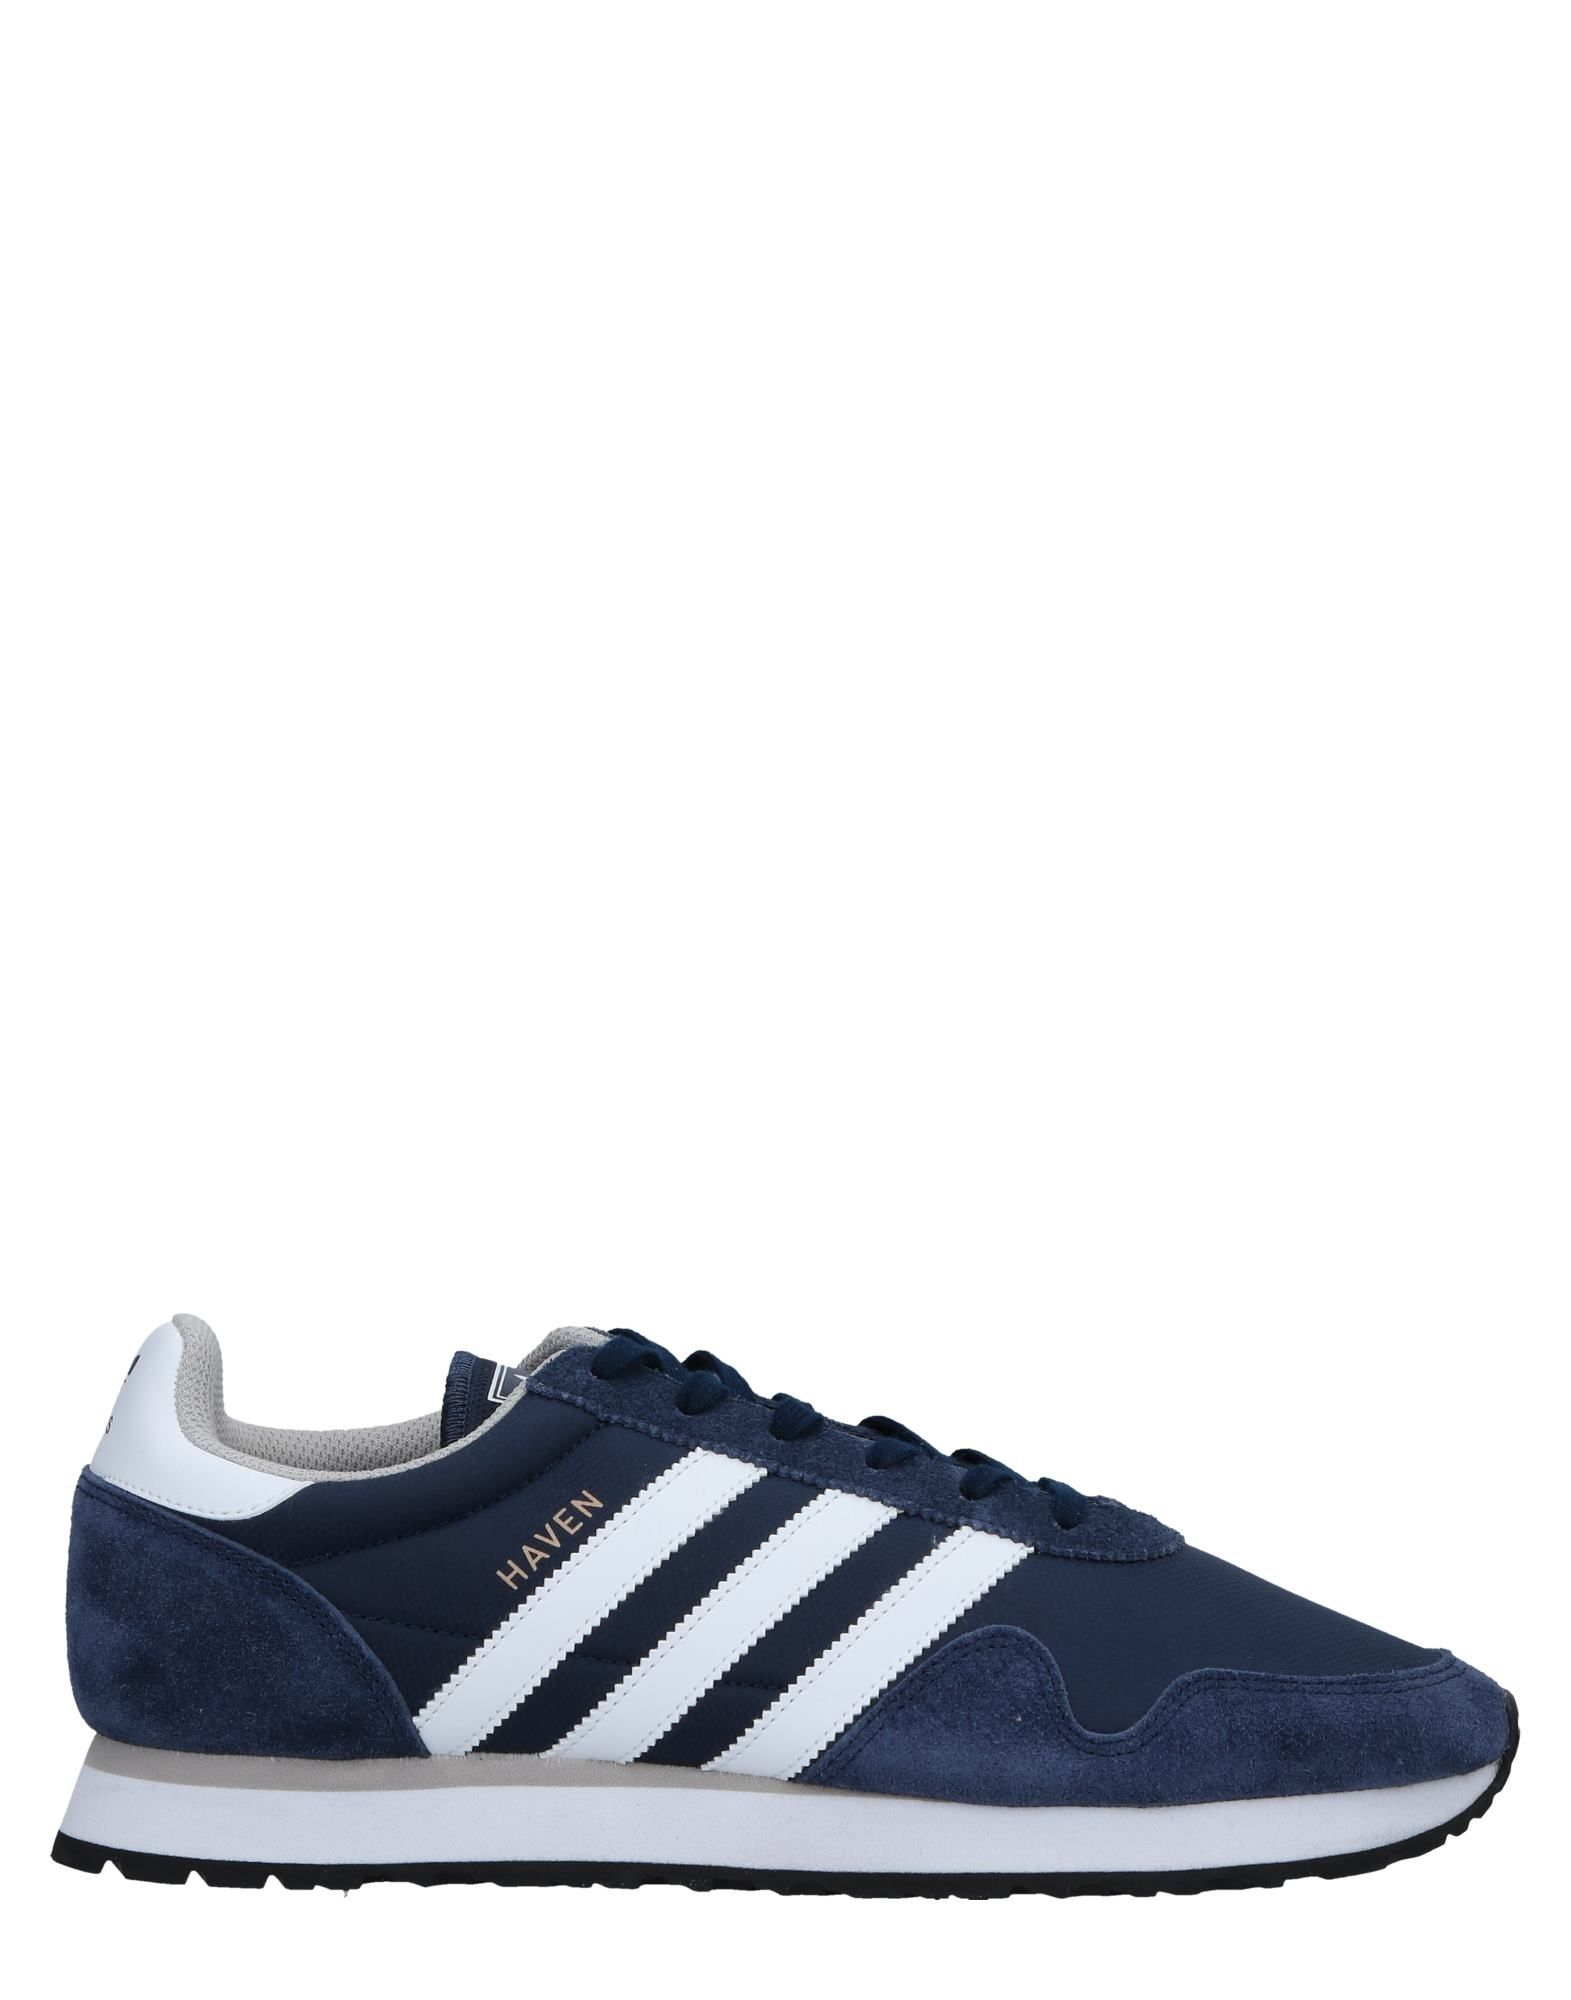 Sneakers Adidas Originals Uomo - 11518855LD